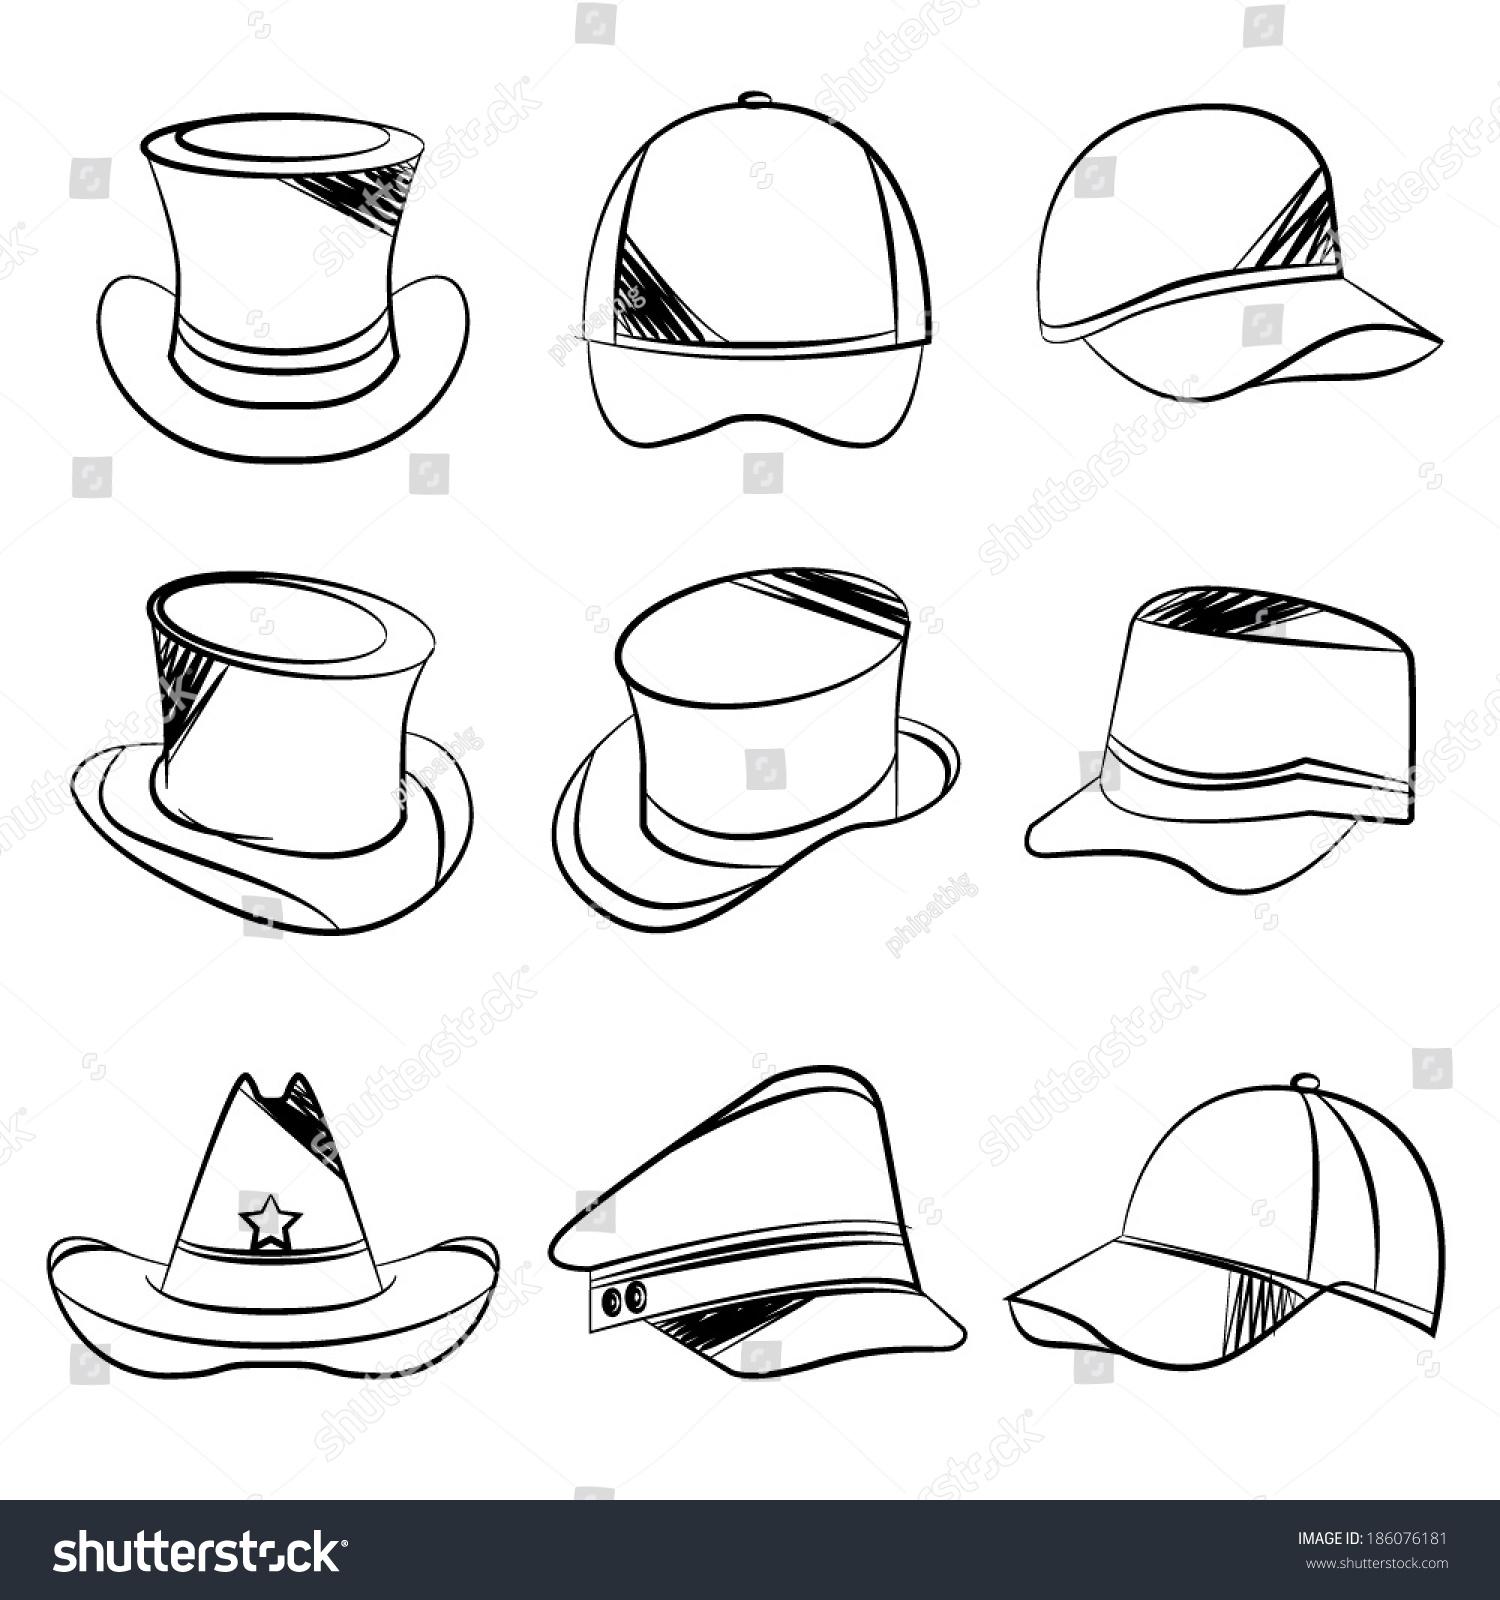 58704e77 Sketch Collection Hats Stock Vector (Royalty Free) 186076181